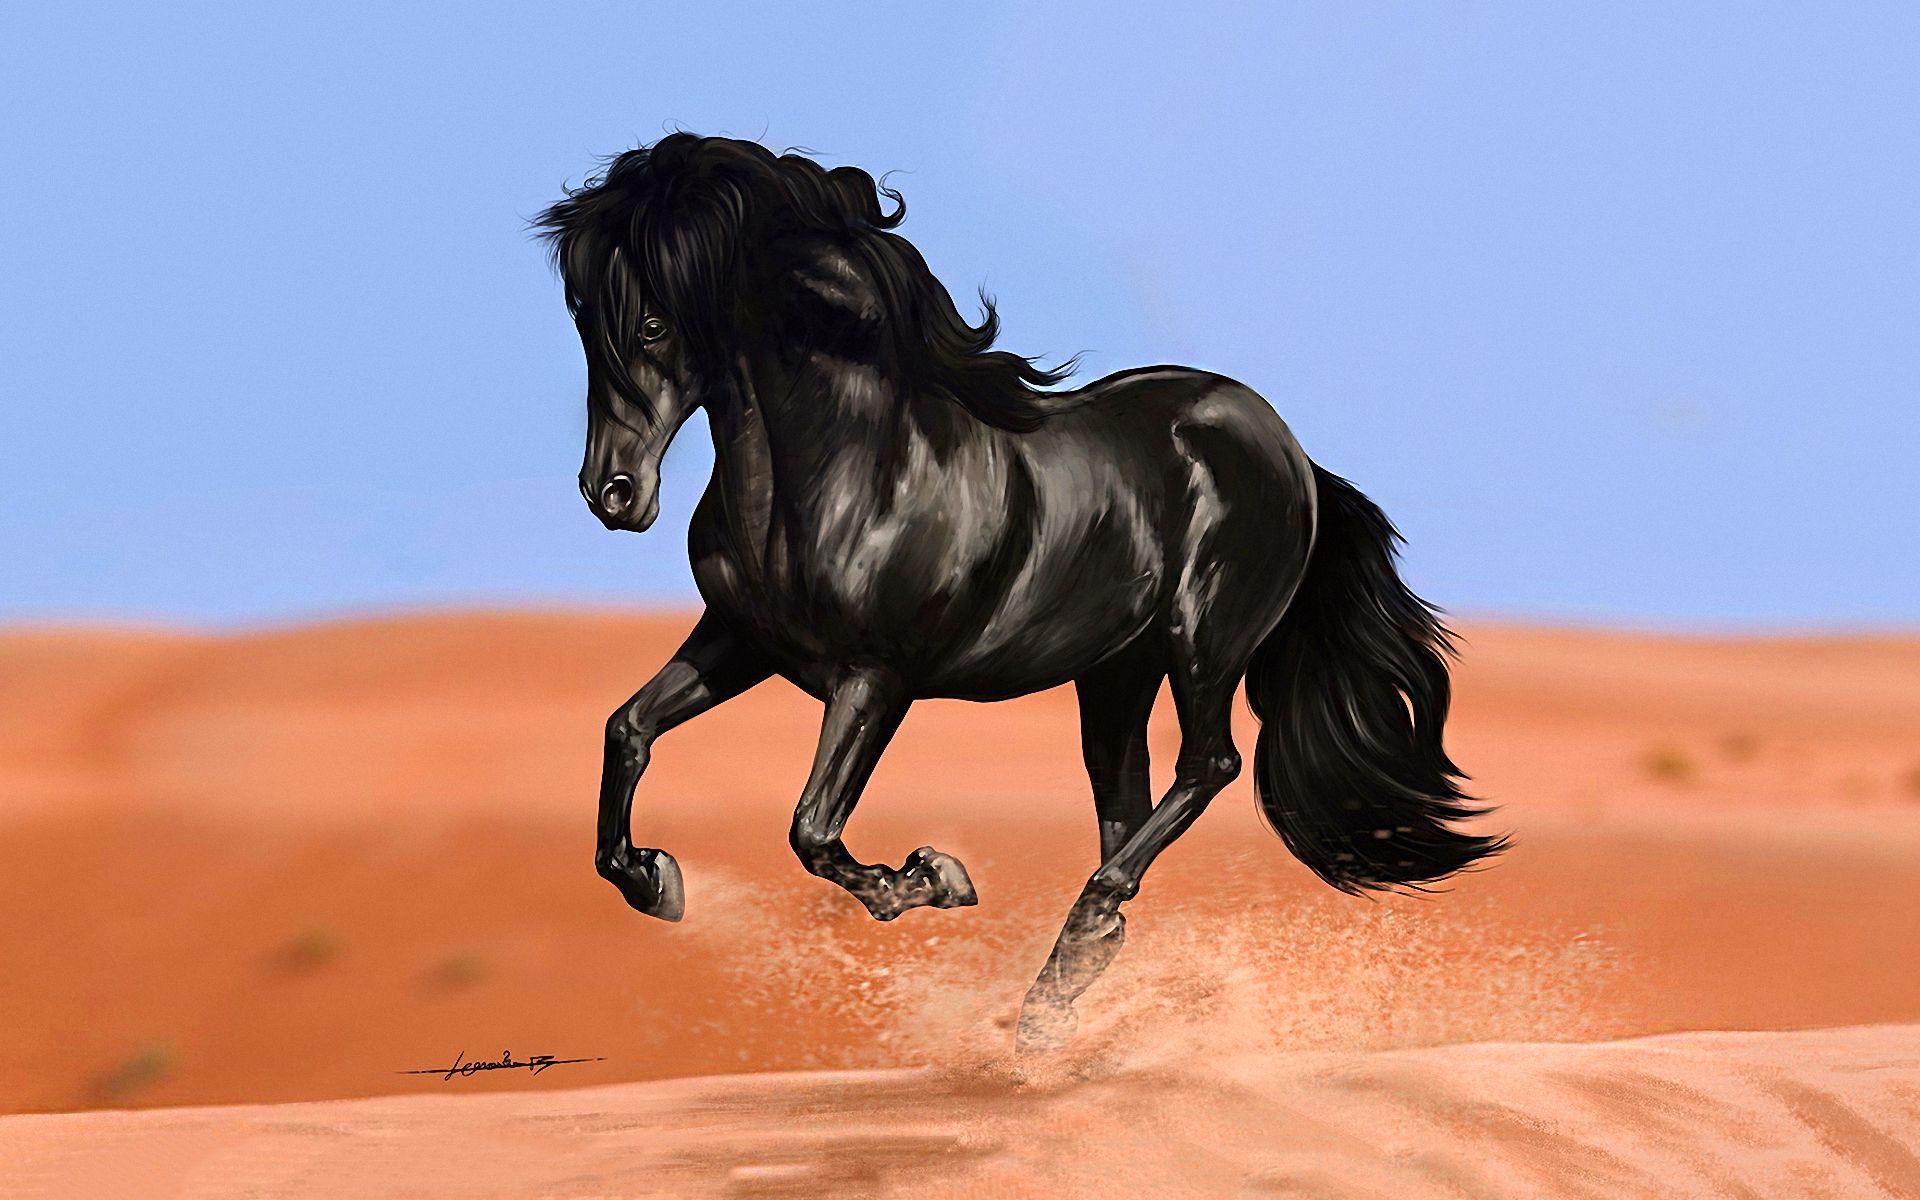 Popular Wallpaper Horse Art - 0a907f3e43e94029eb030385c4422f5a  Image_8310098.jpg